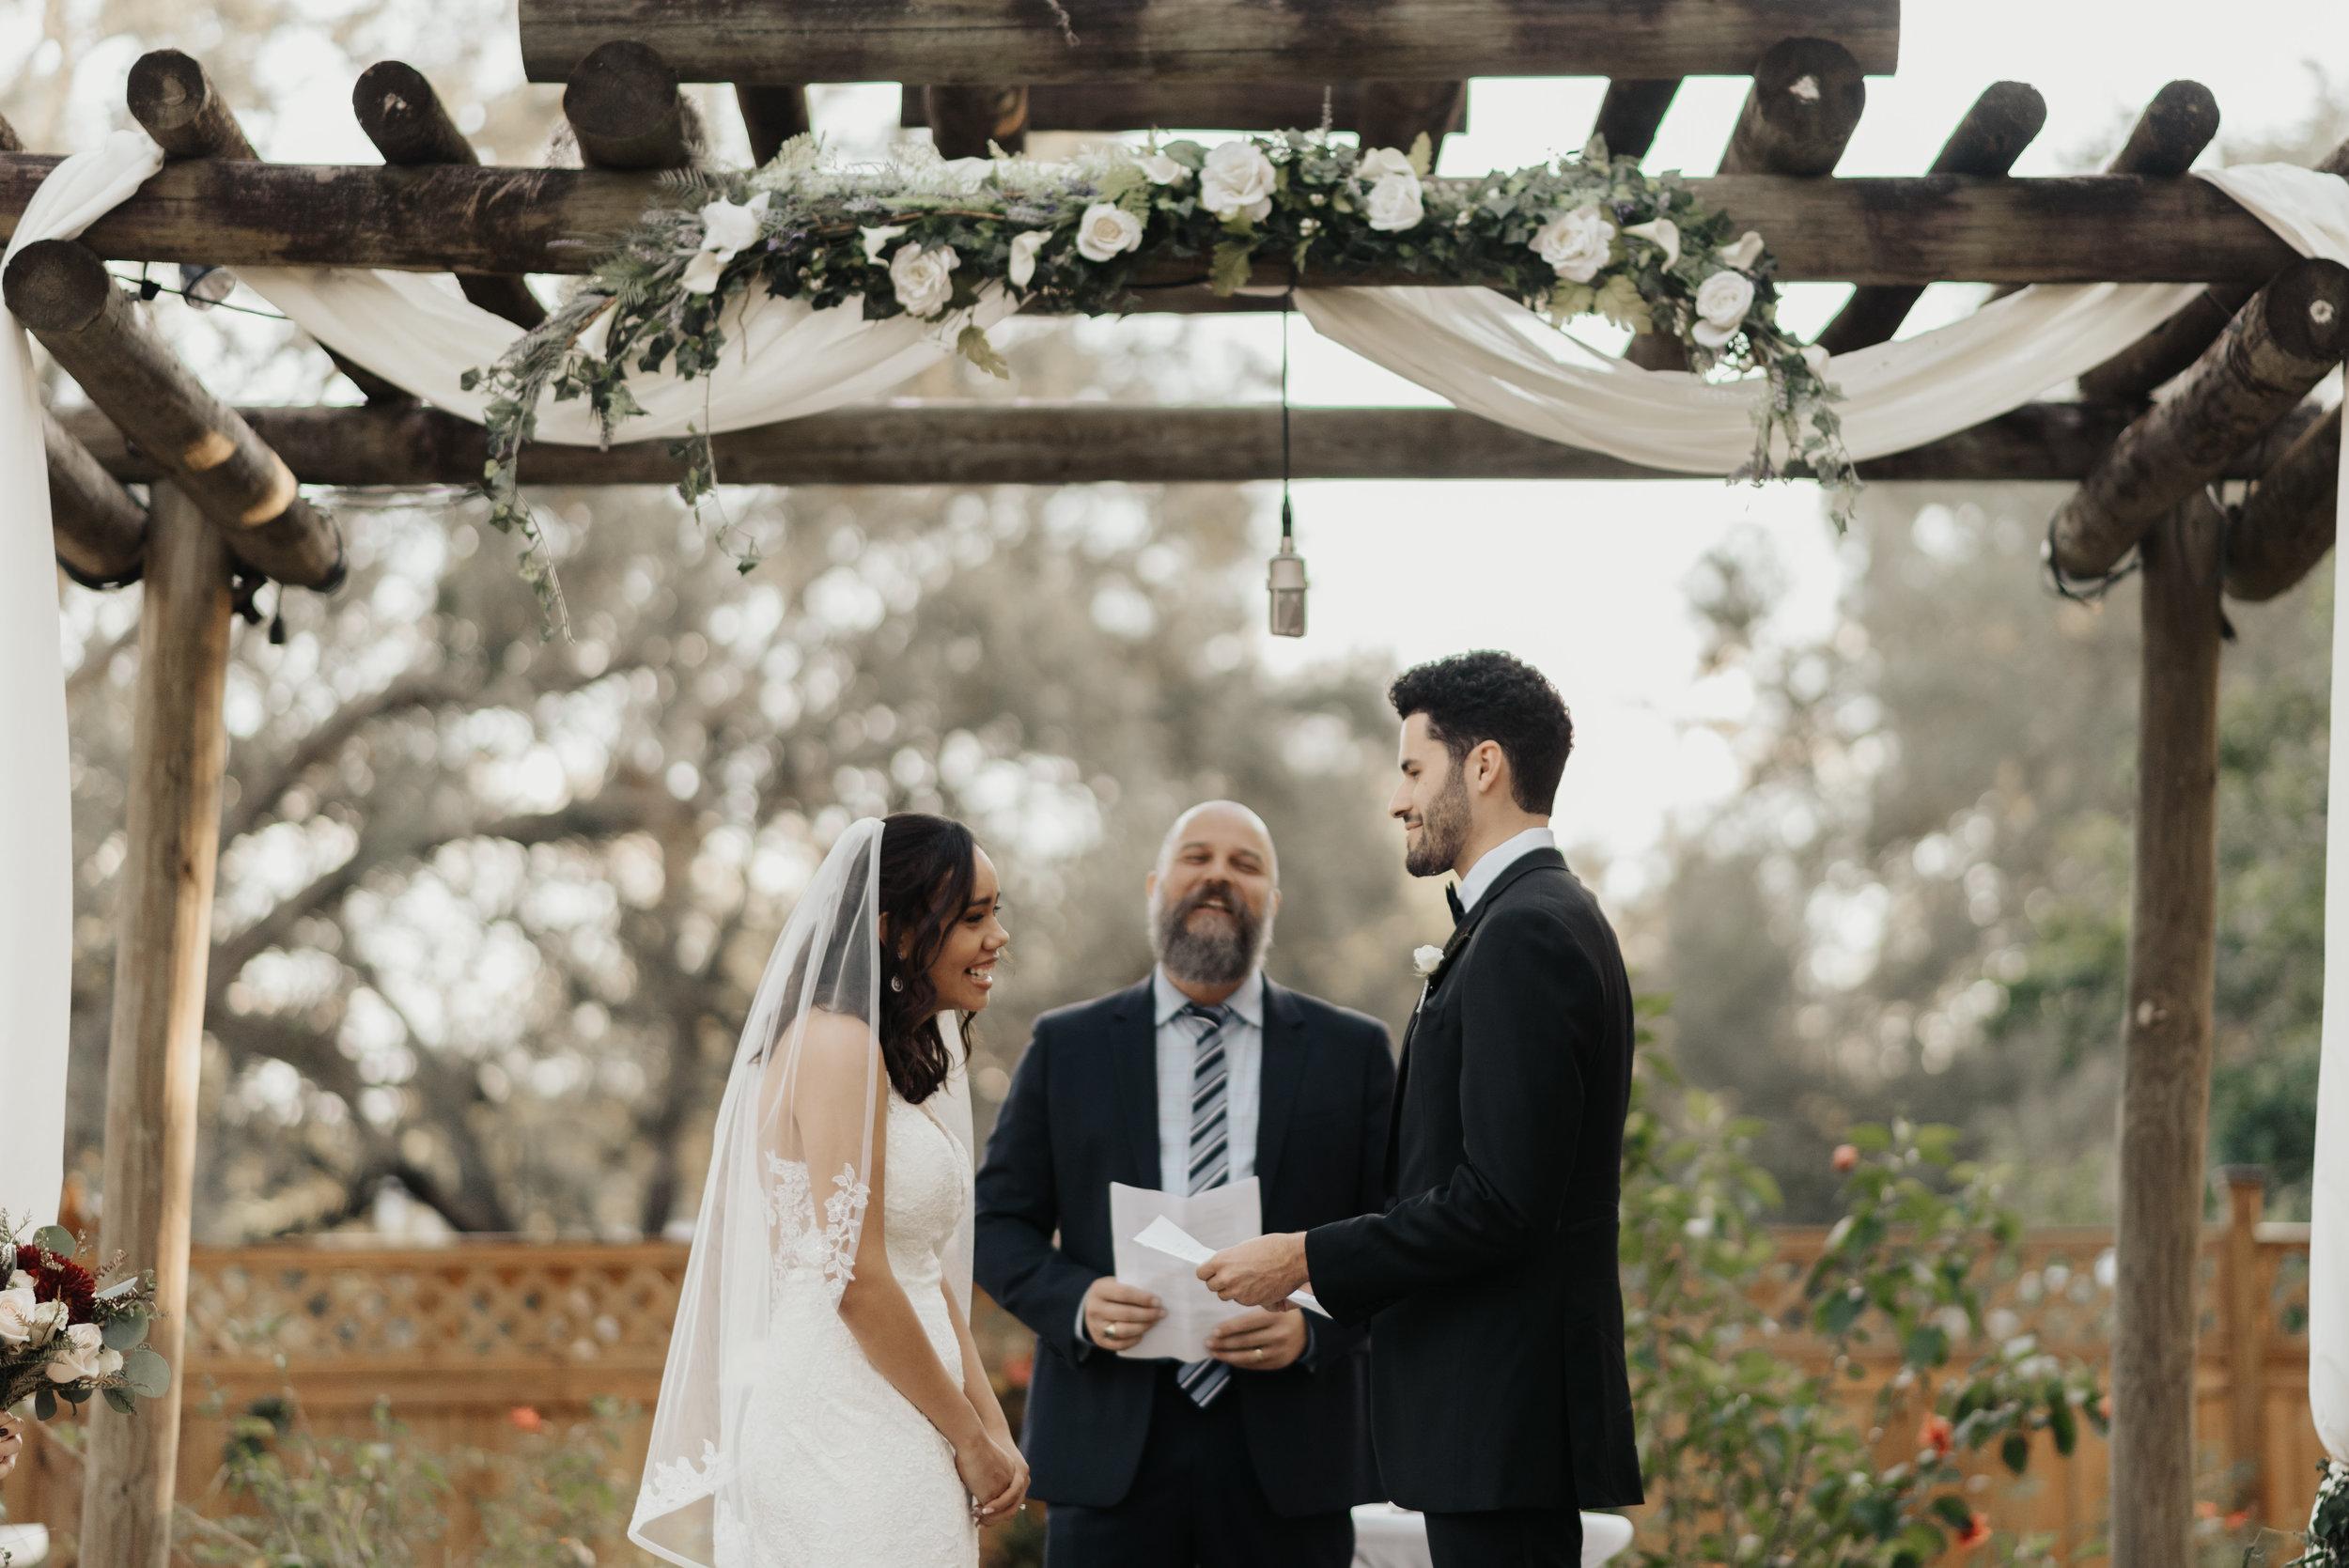 Kirstie-AJ-Wedding-9961.jpg